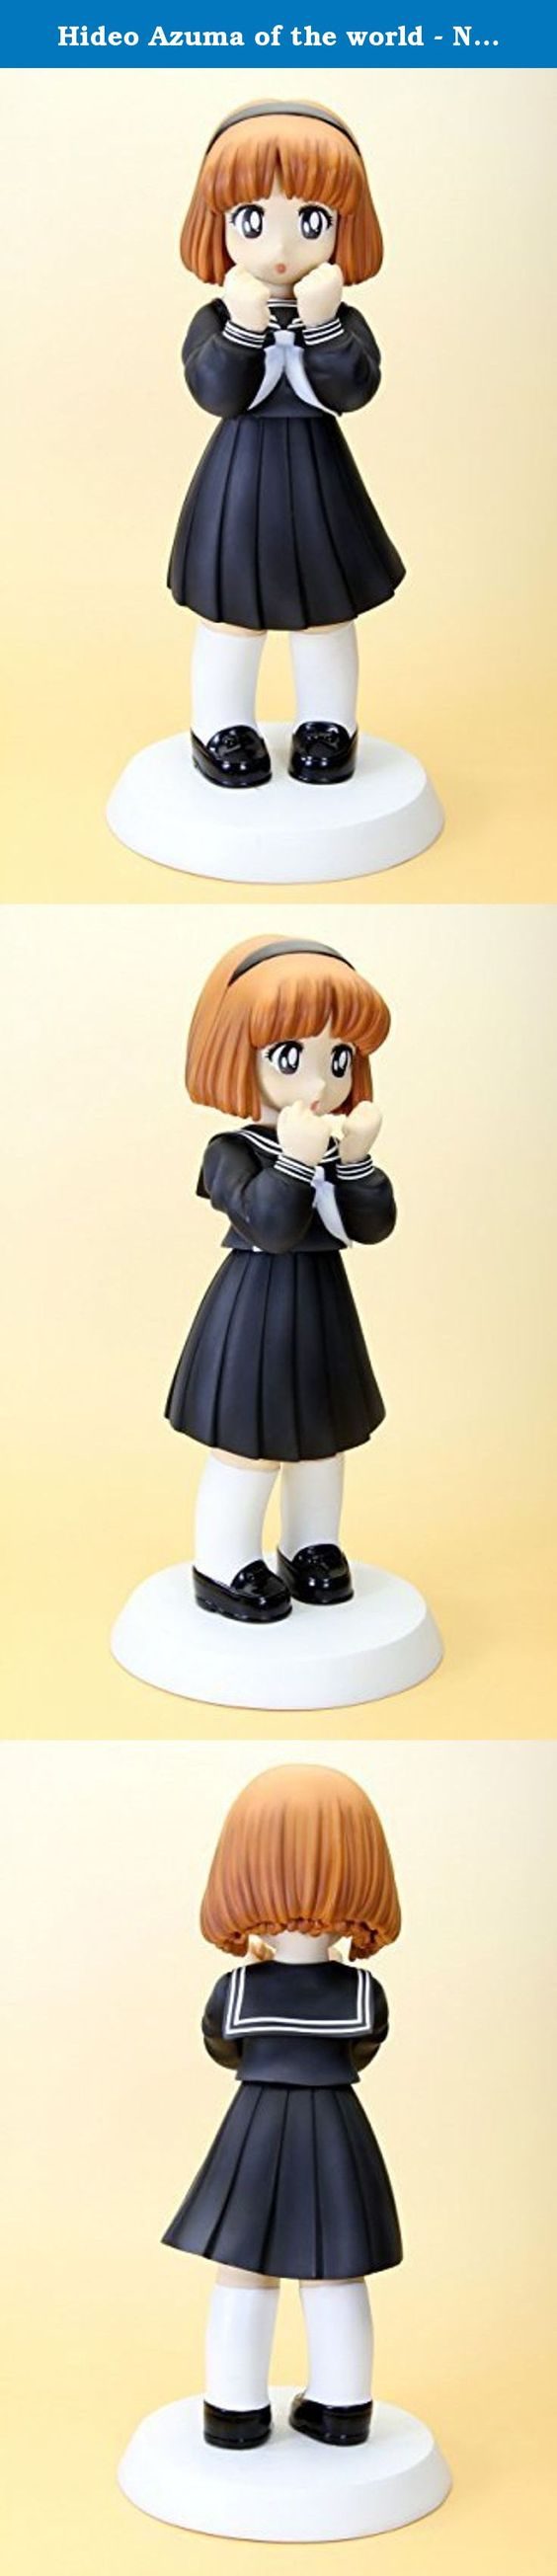 Hideo Azuma of the world - Nanako - 1/7 PVC Figure. It's shipped off from Japan.